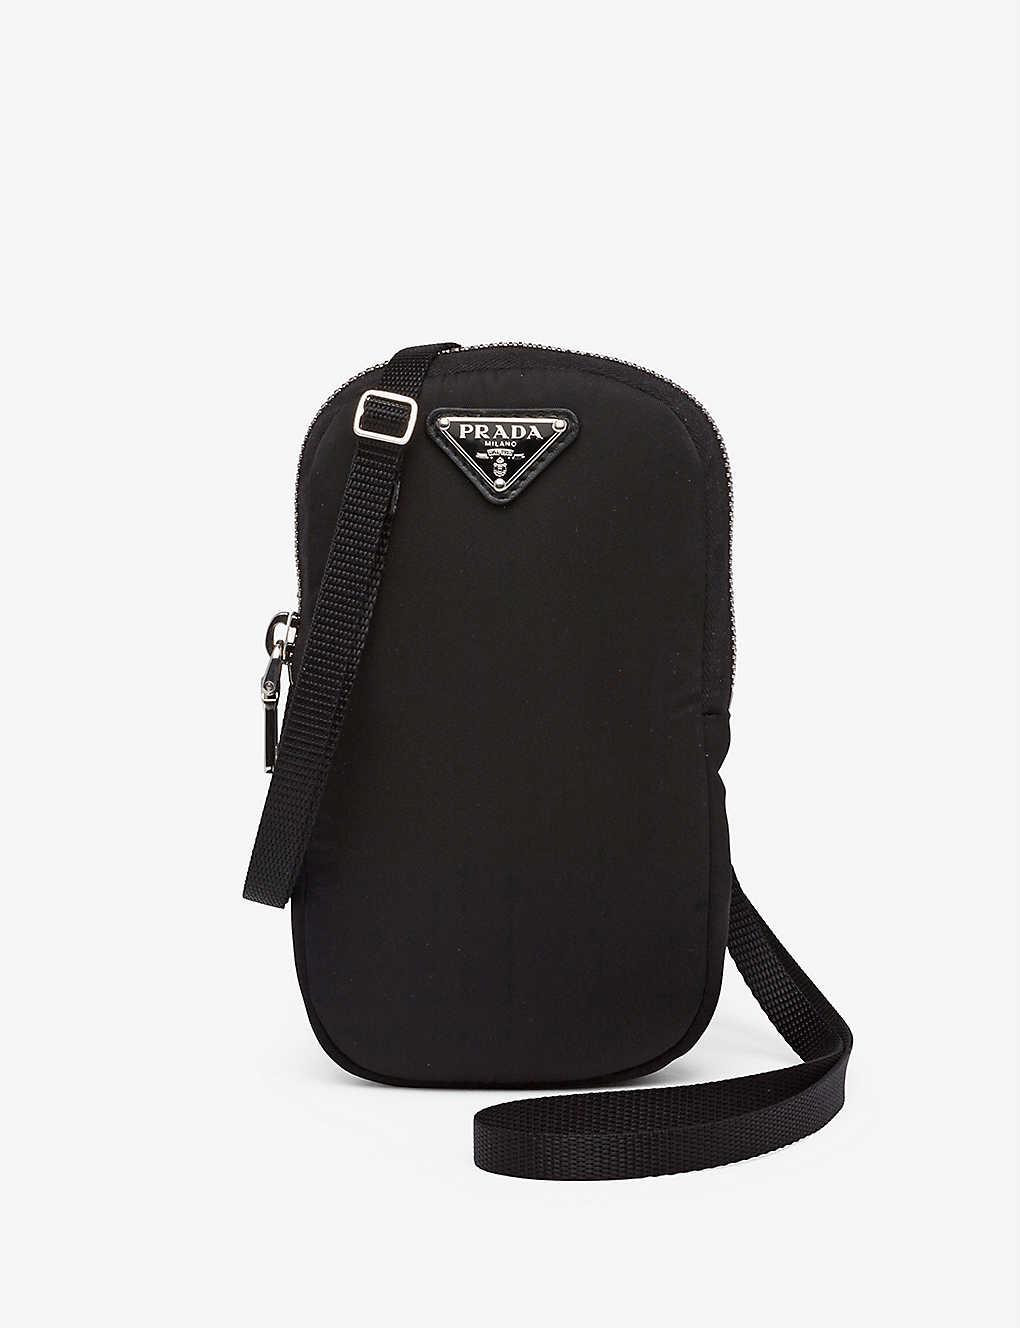 Prada Re-Nylon Cross Body Bag